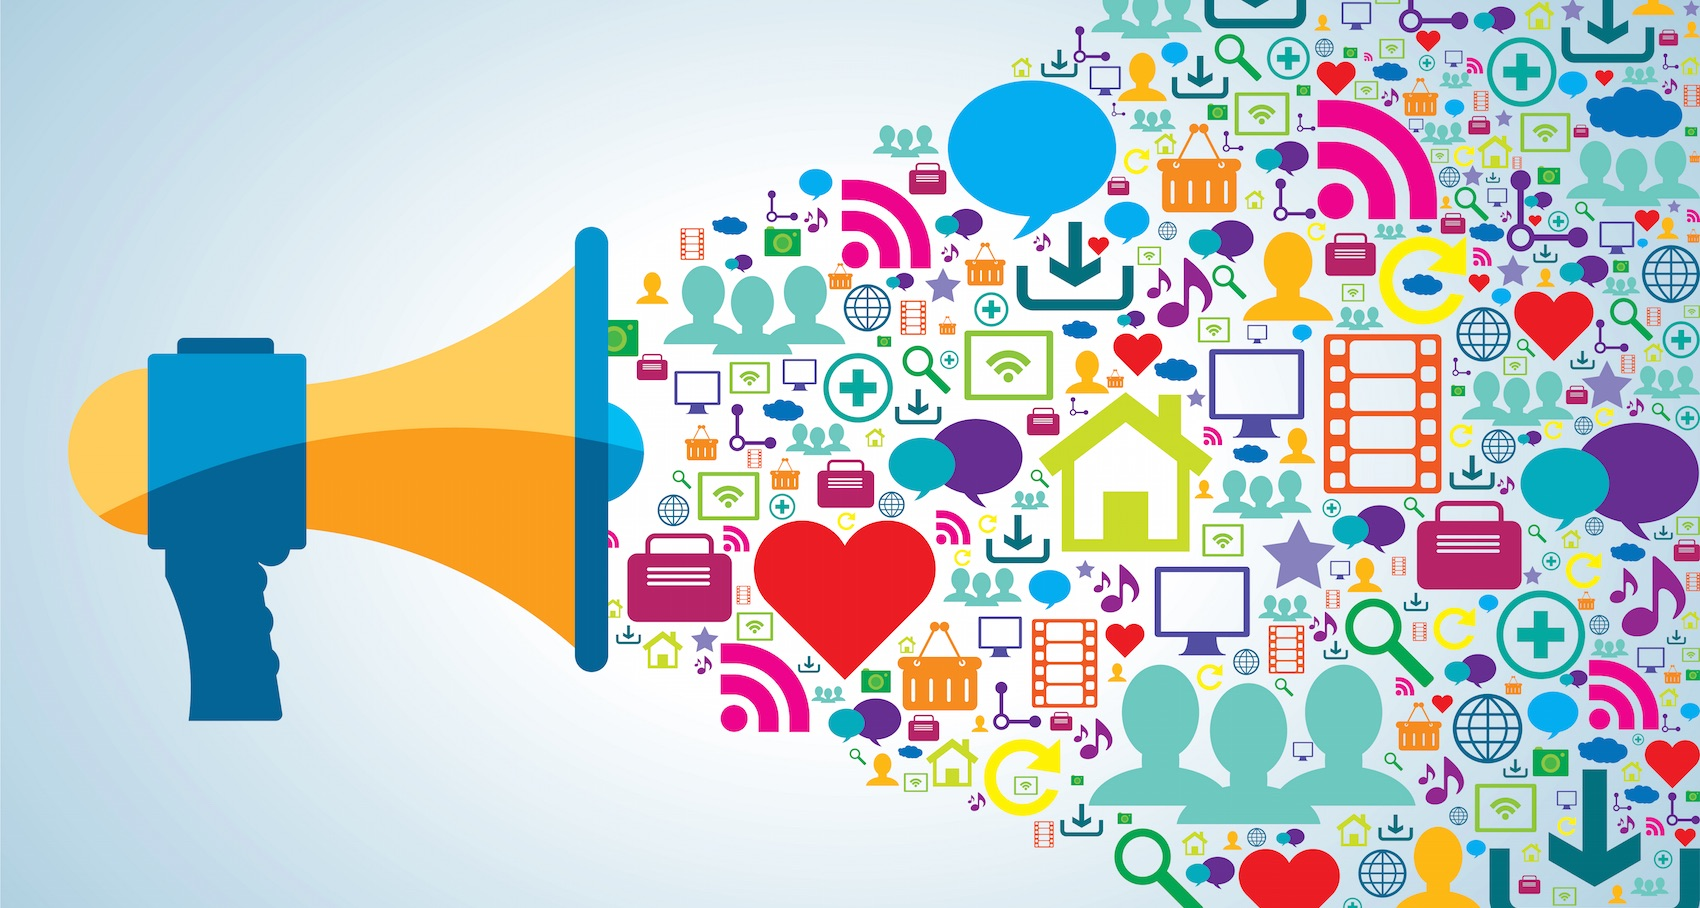 Does Your Organic Marketing Belong On Social Media?